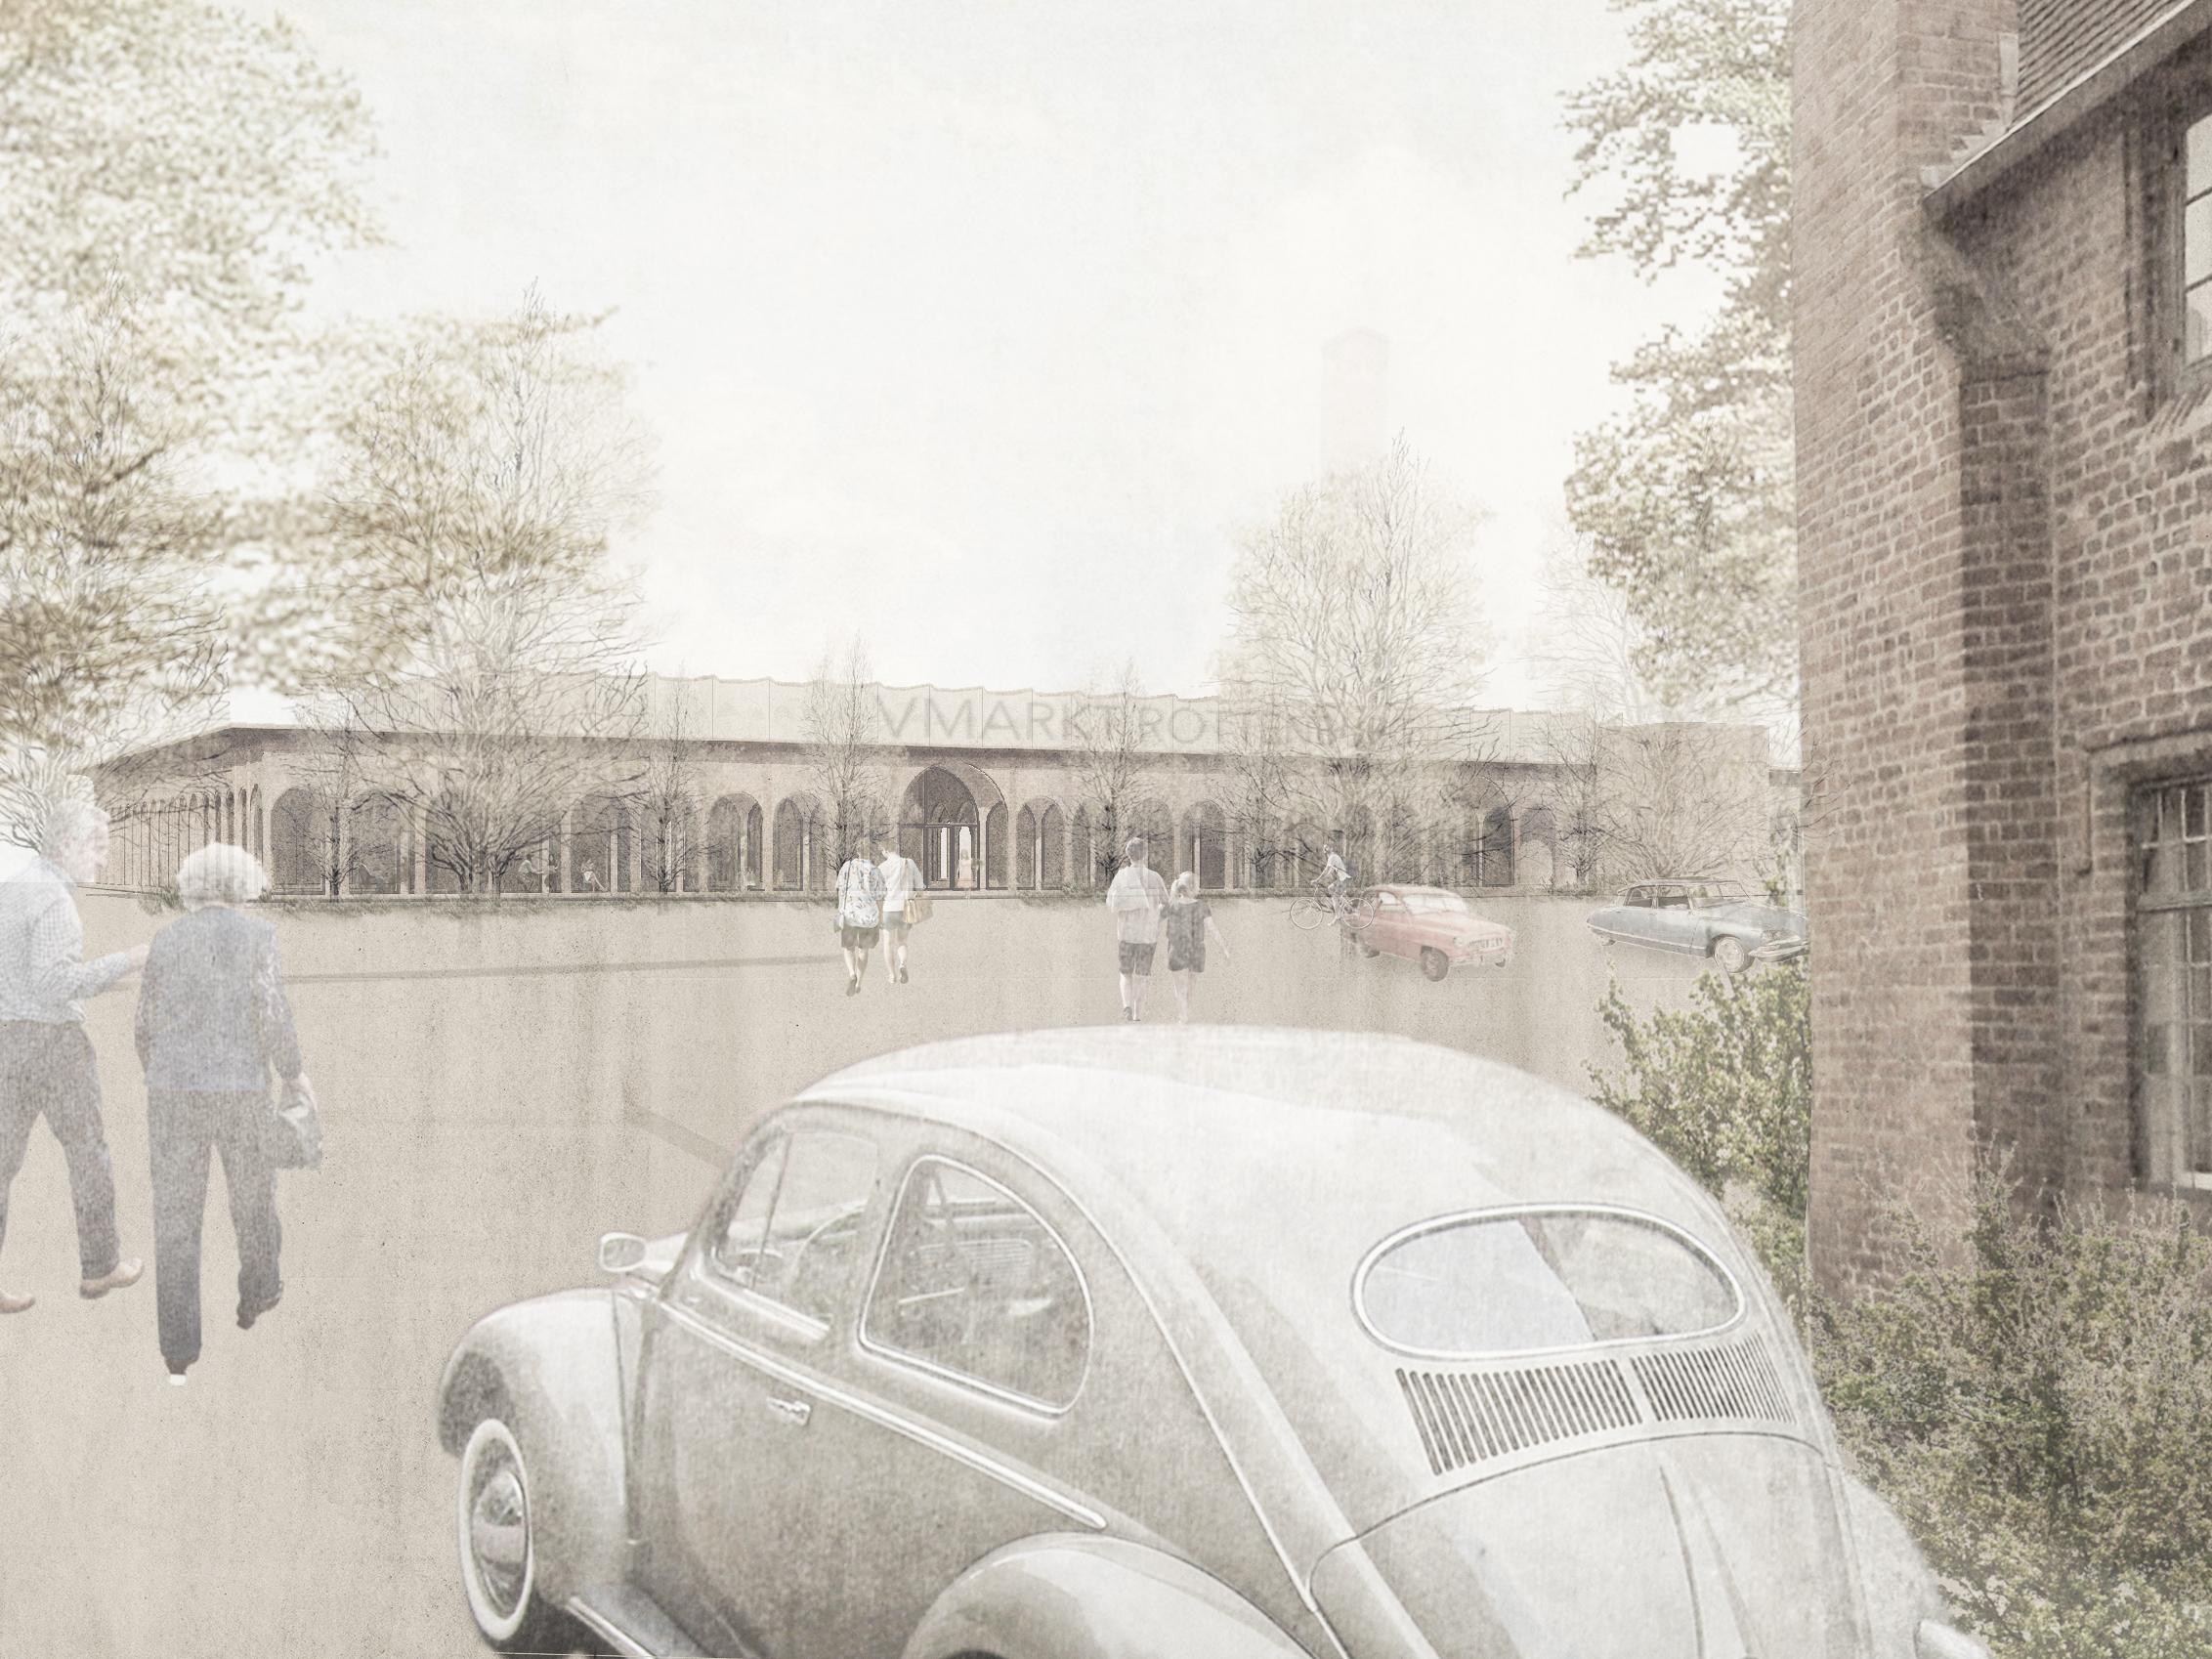 Becker-Architekten-Becker-Architects-V-Markt-Rottenburg-P01